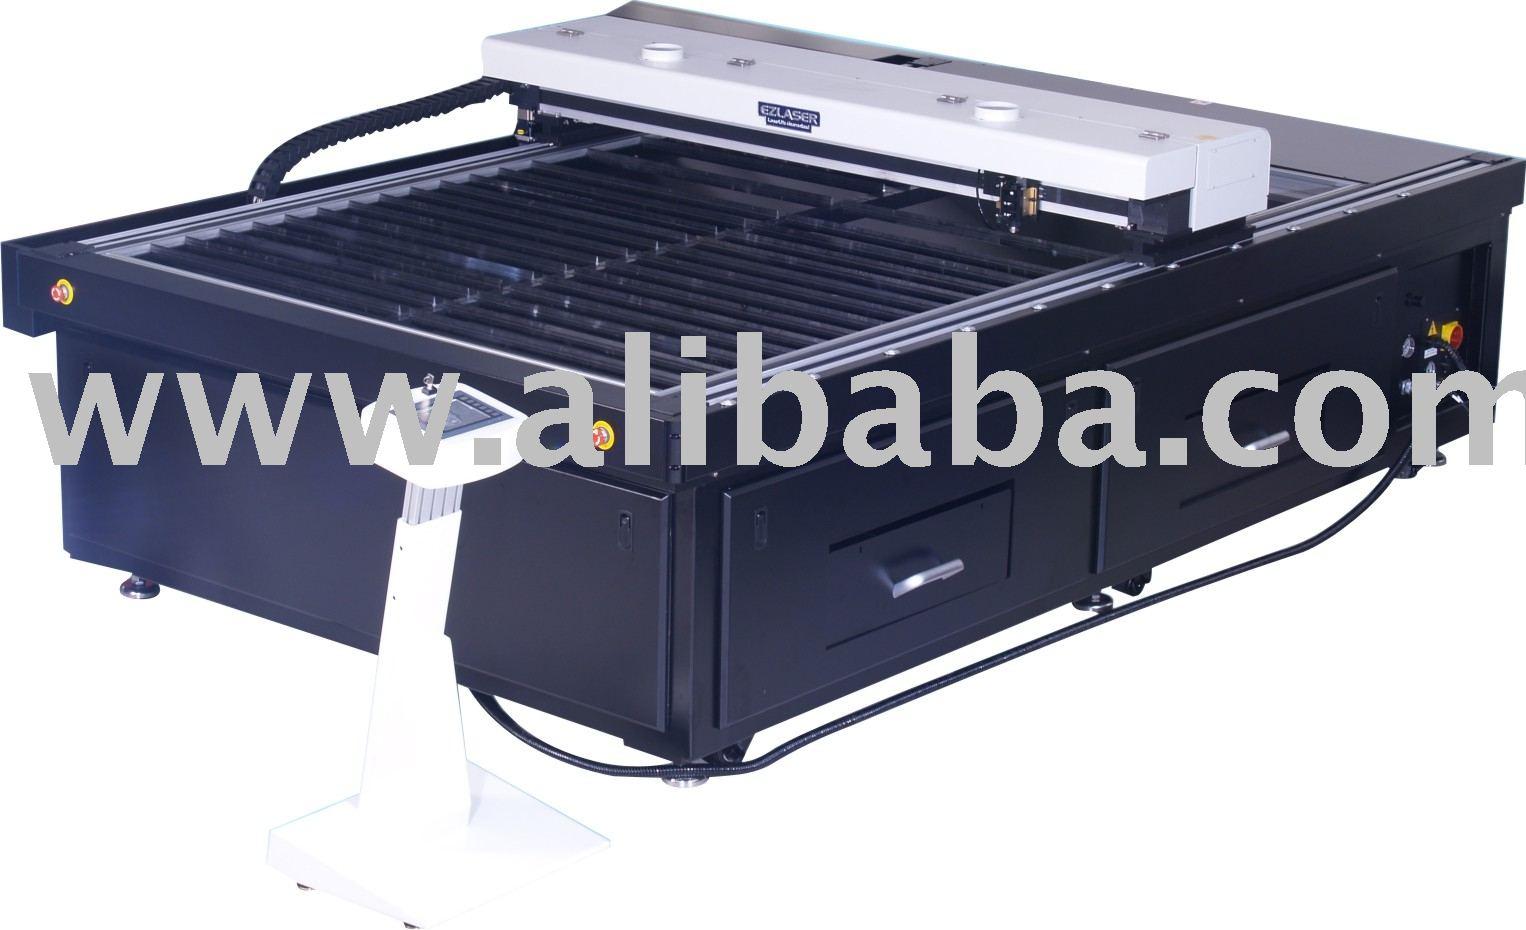 Large Format Laser Cutting System